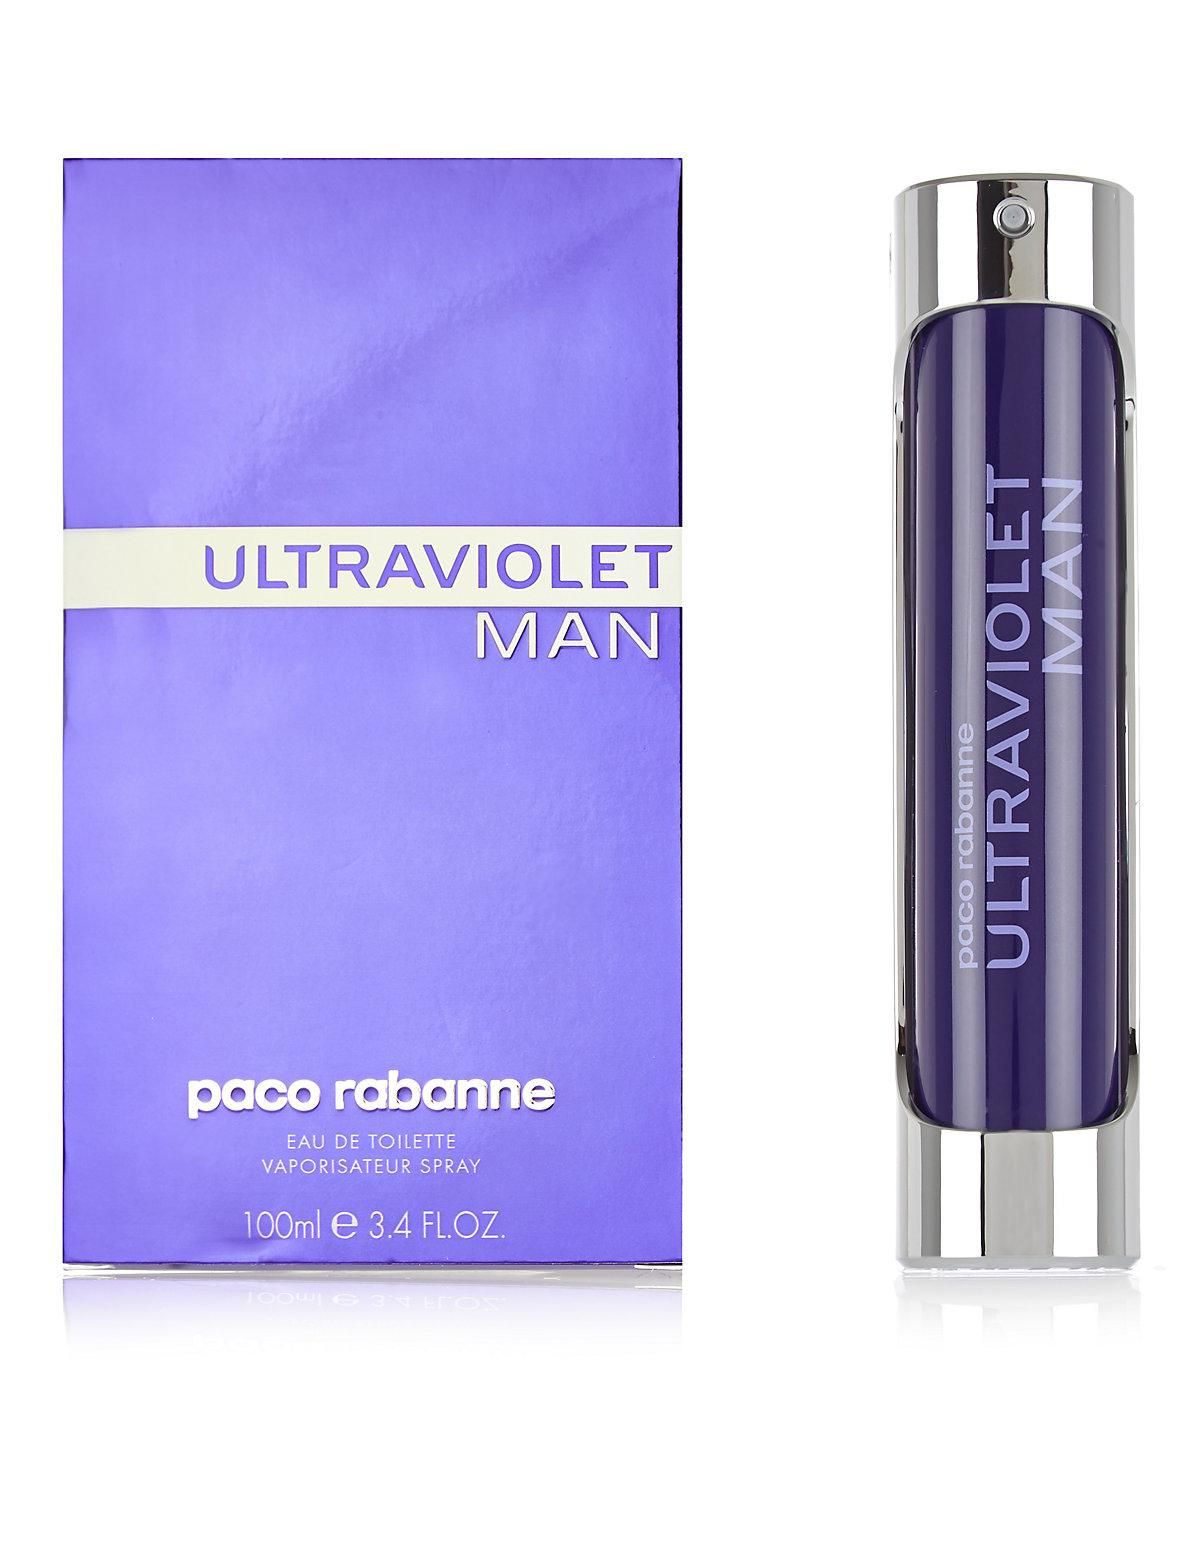 Paco Rabanne Ultraviolet Eau de Toilette Spray 100ml